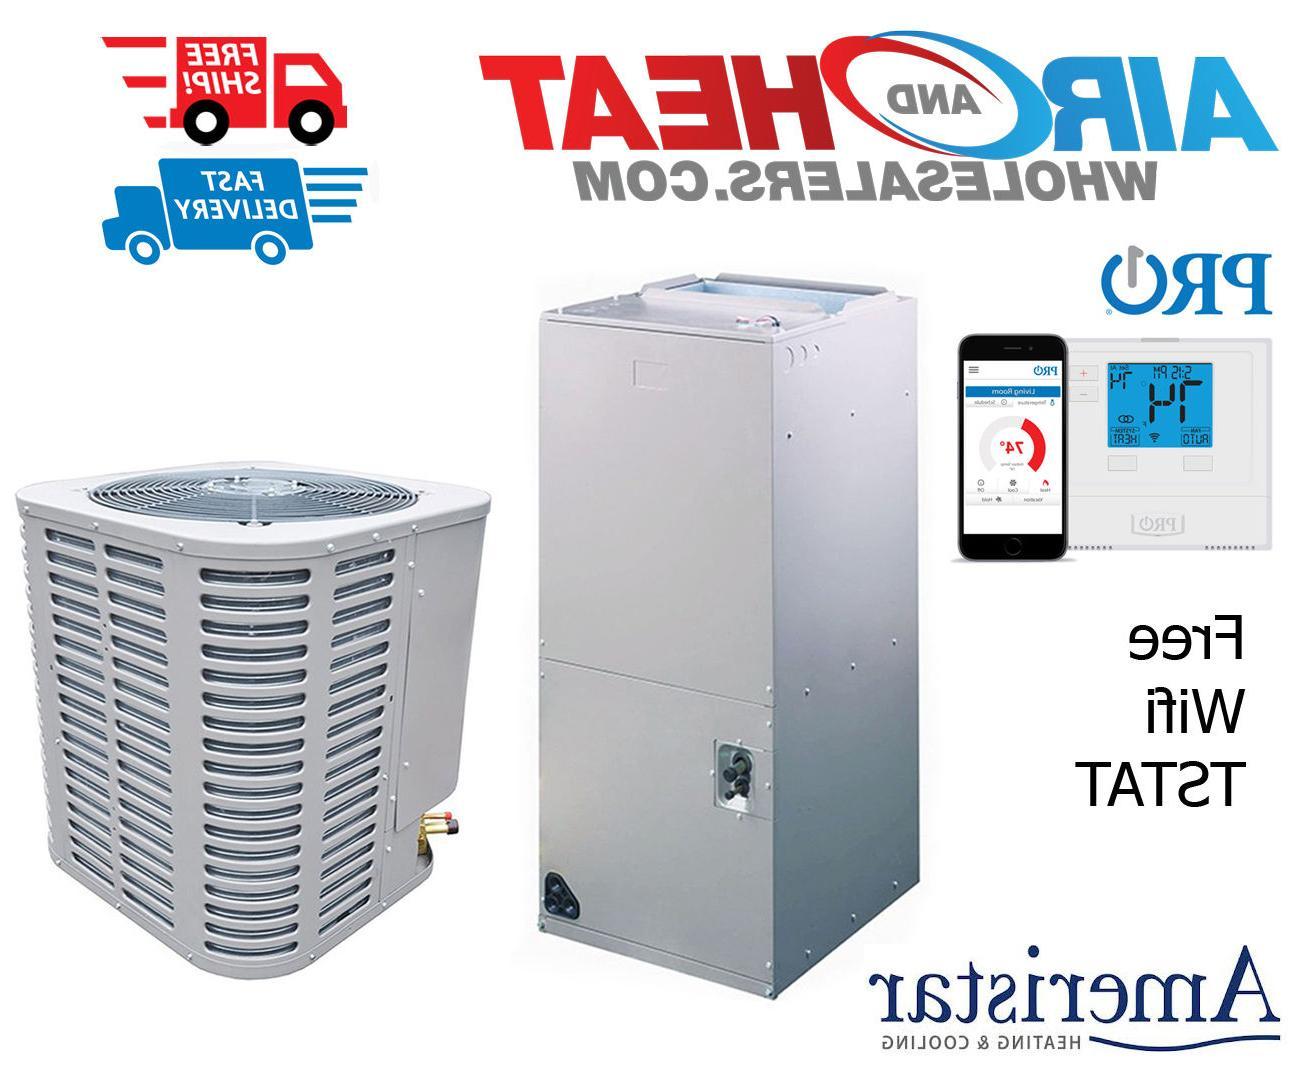 hight resolution of new ameristar 3 0 ton split type air conditioner 14 seer